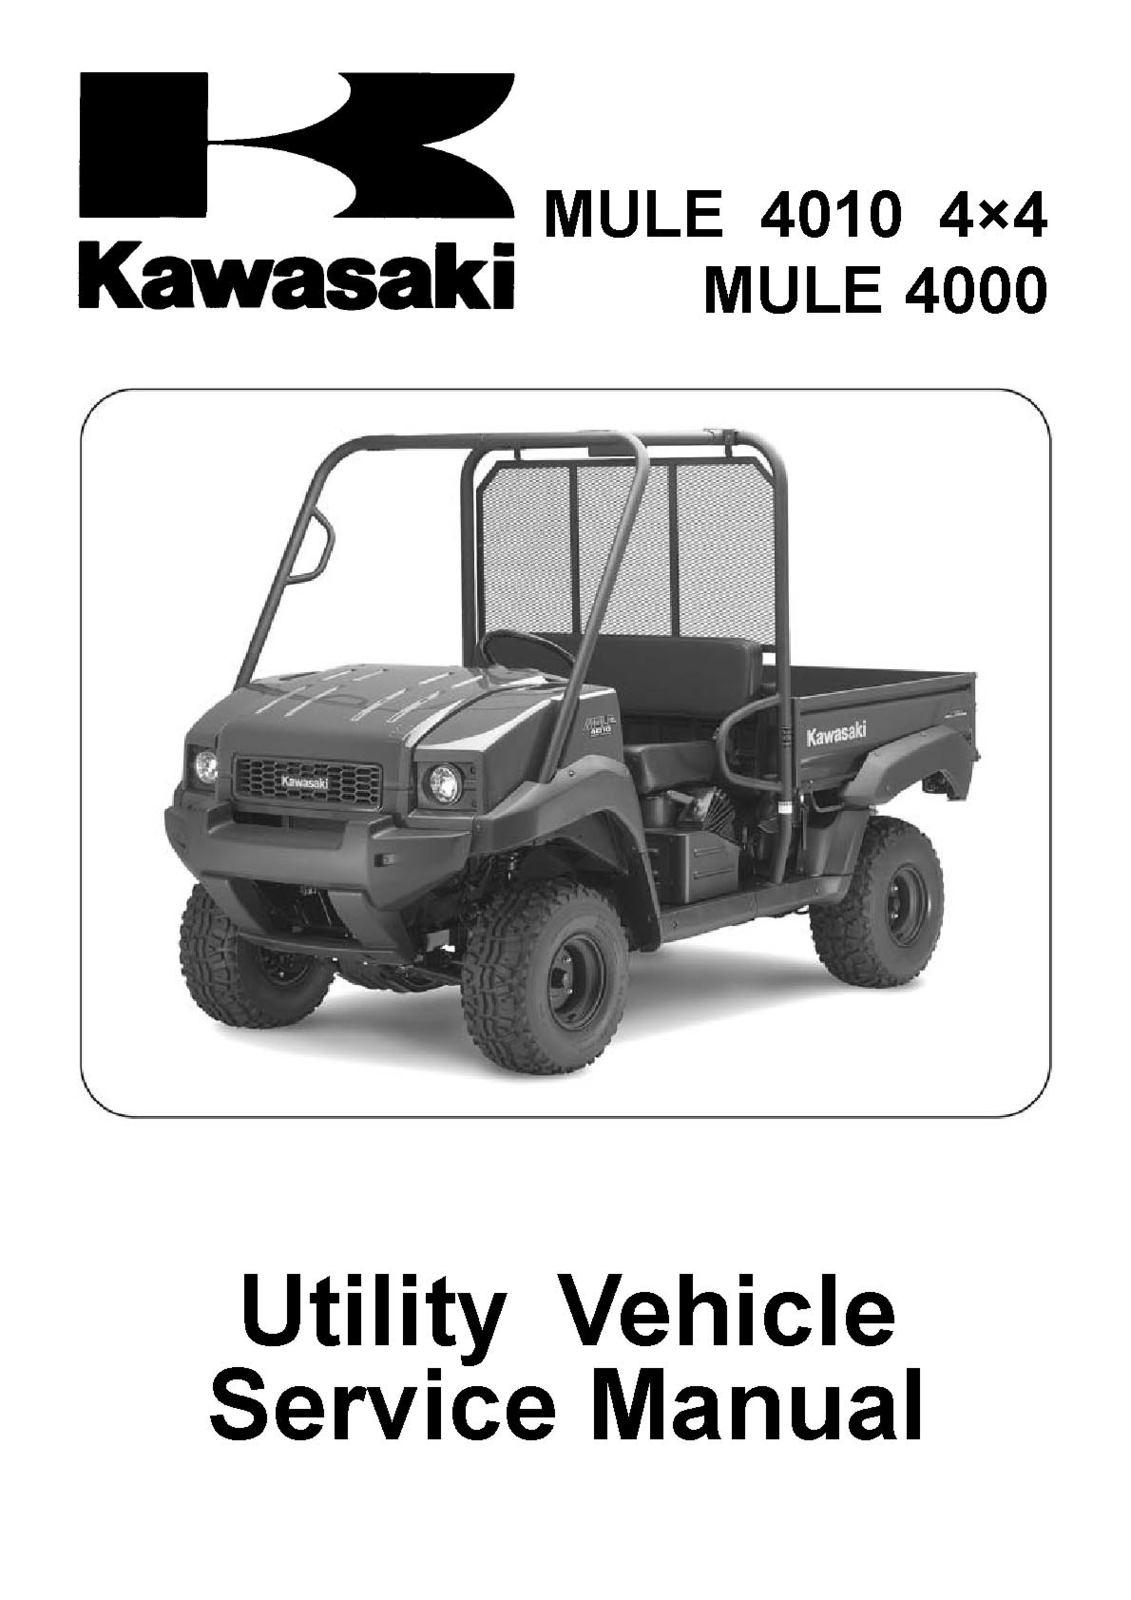 Kawasaki Mule 4000 Wiring Diagram Residential Electrical Symbols For 610 4010 4x4 Shop Service And 44 Similar Items Rh Bonanza Com 2007